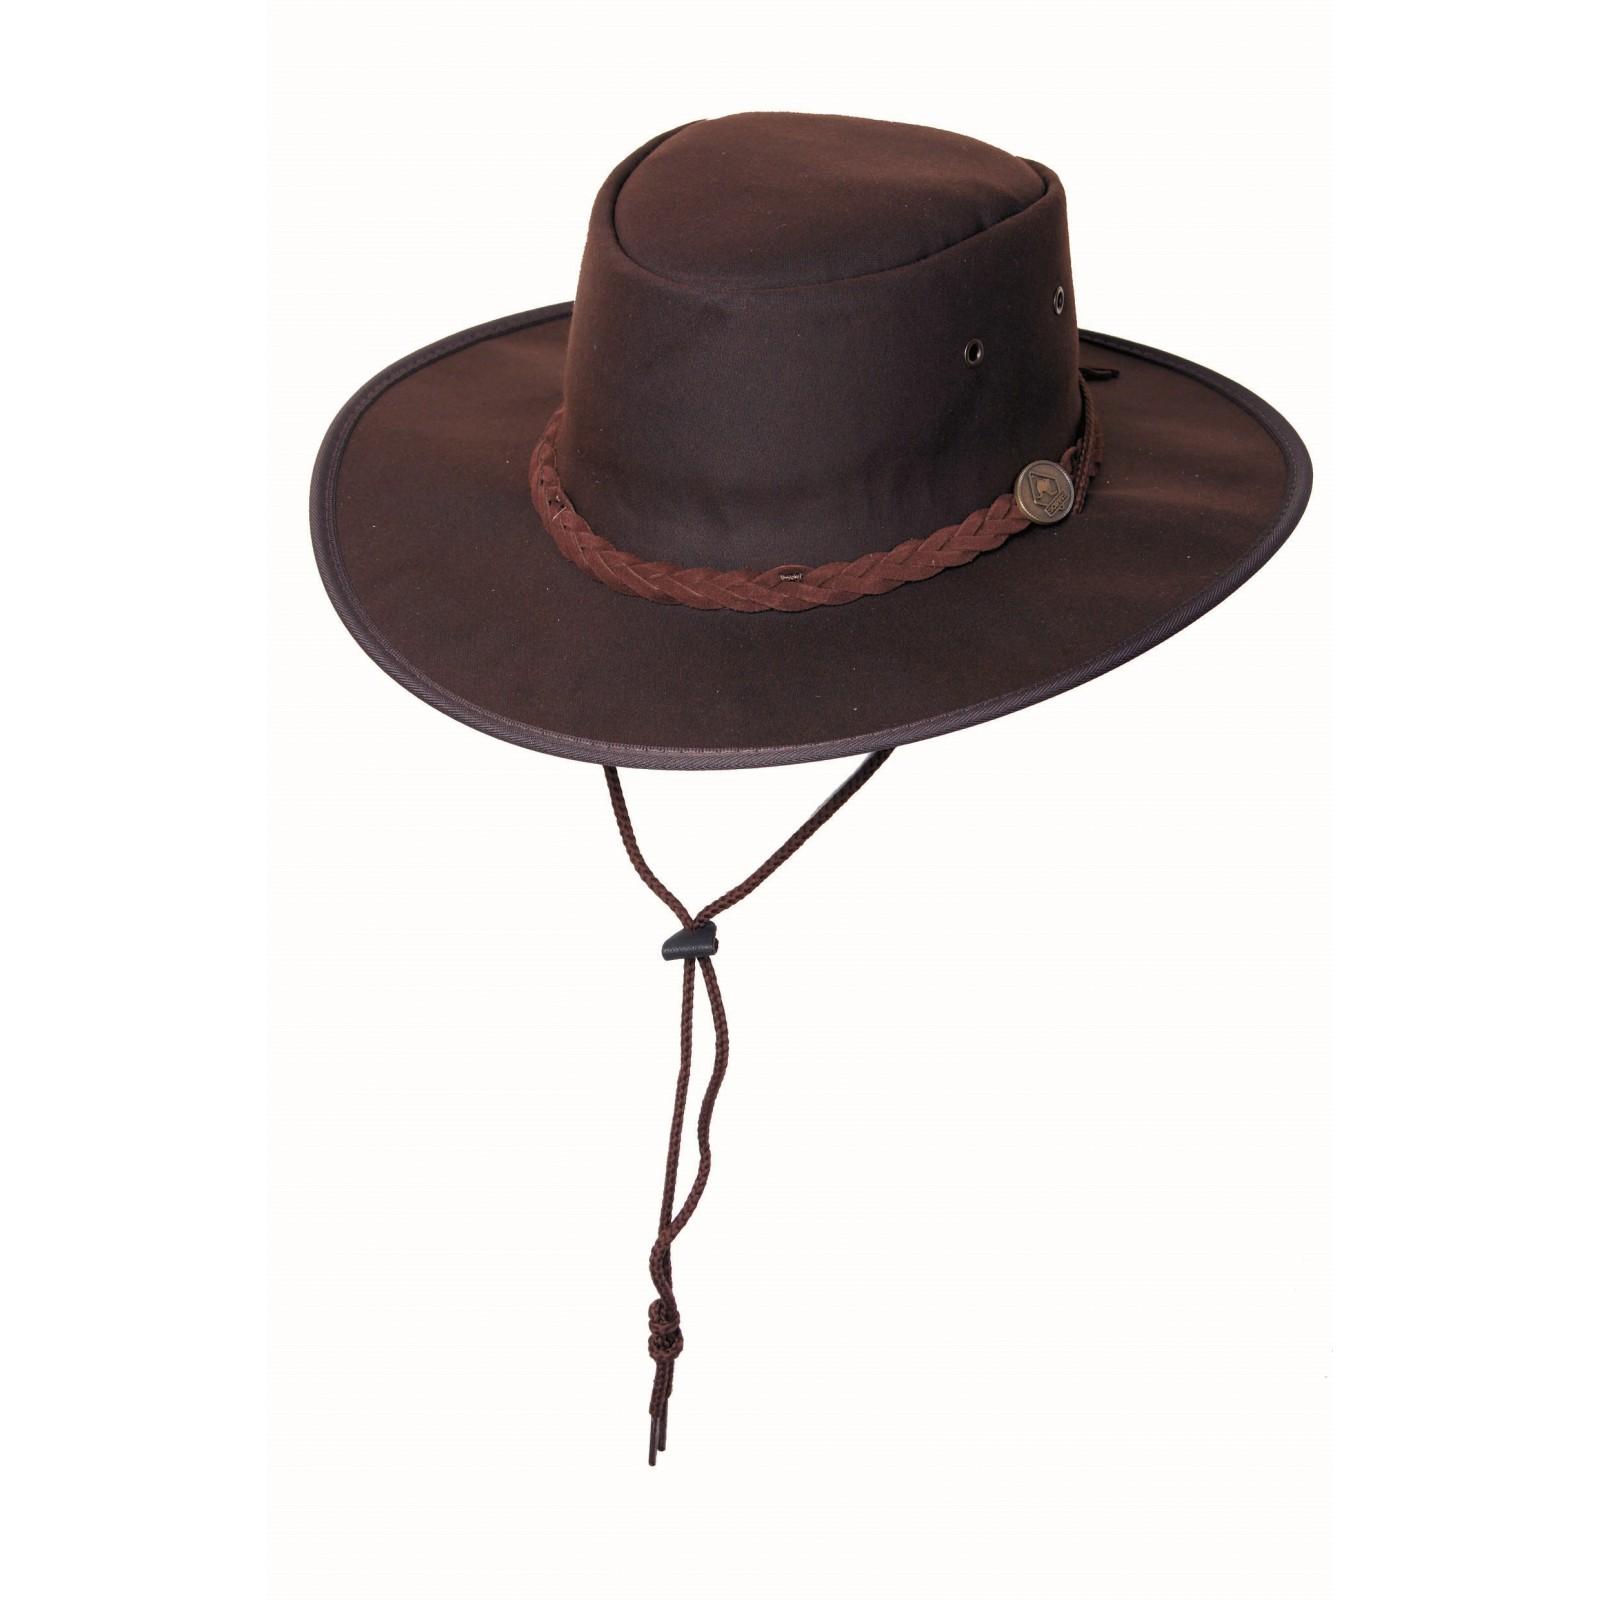 Oilskin Gibson hat